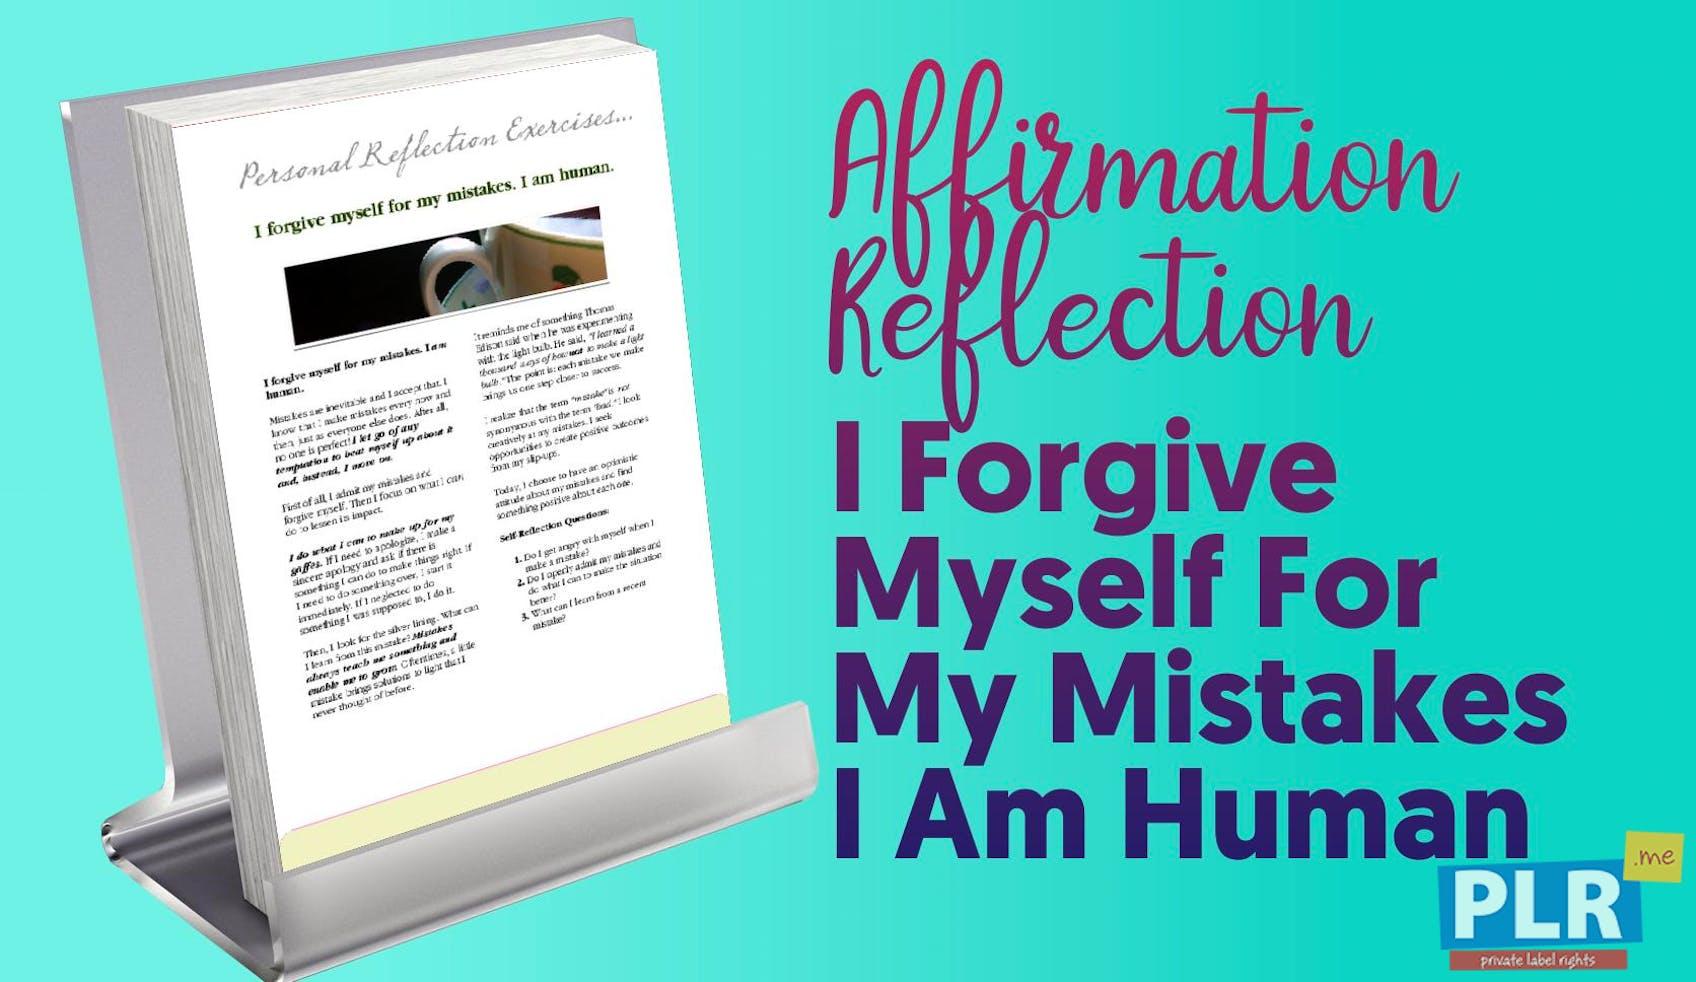 I Forgive Myself For My Mistakes I Am Human